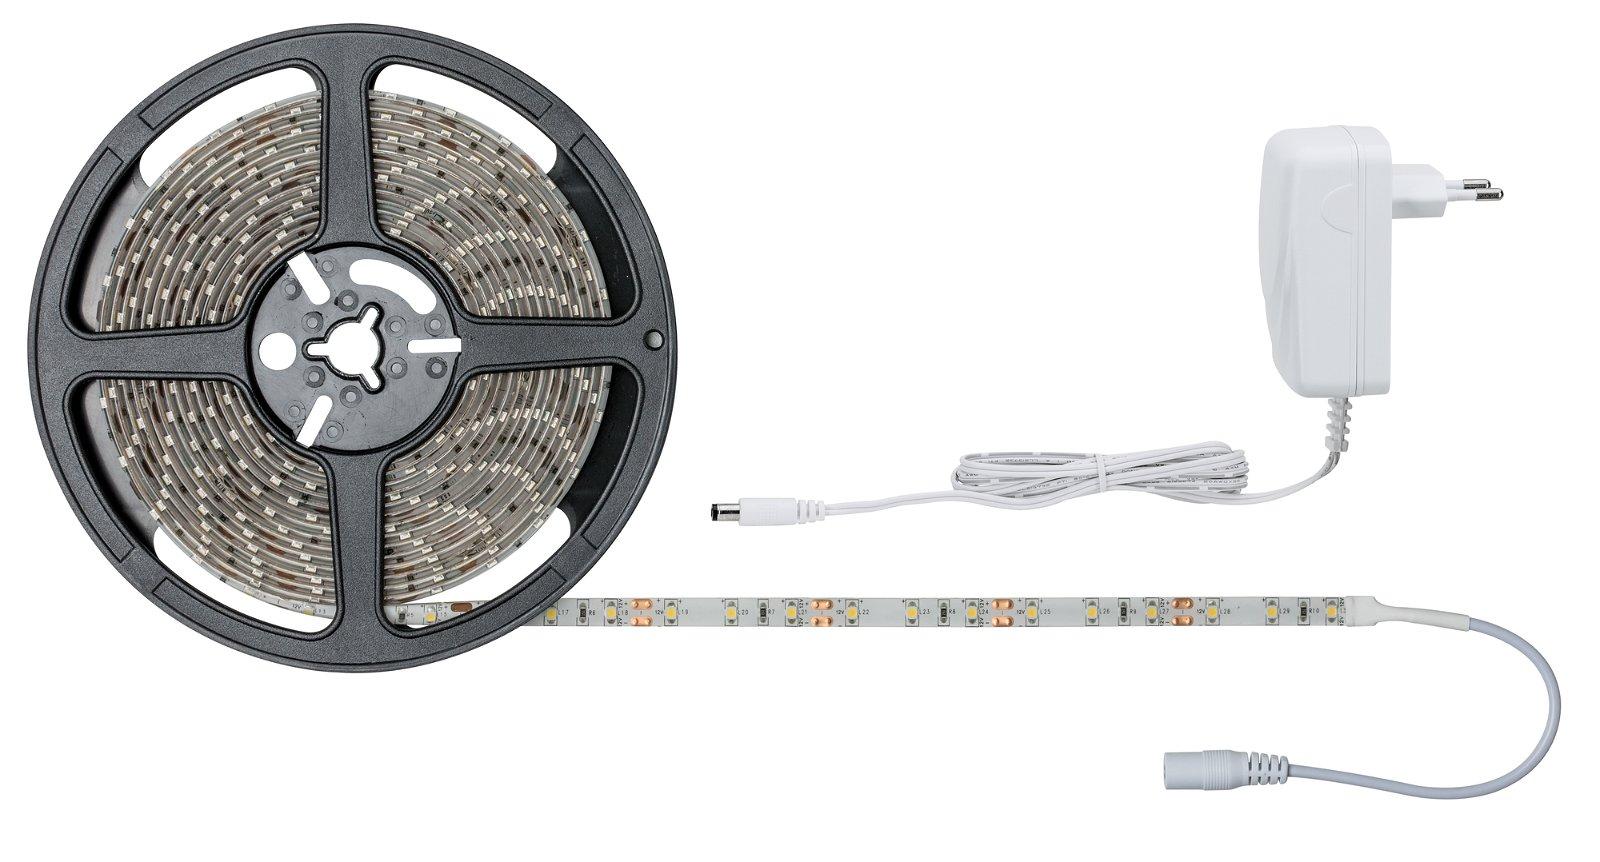 SimpLED LED Strip Warmweiß 5m beschichtet 17W 192lm/m 60LEDs/m 3000K 18VA